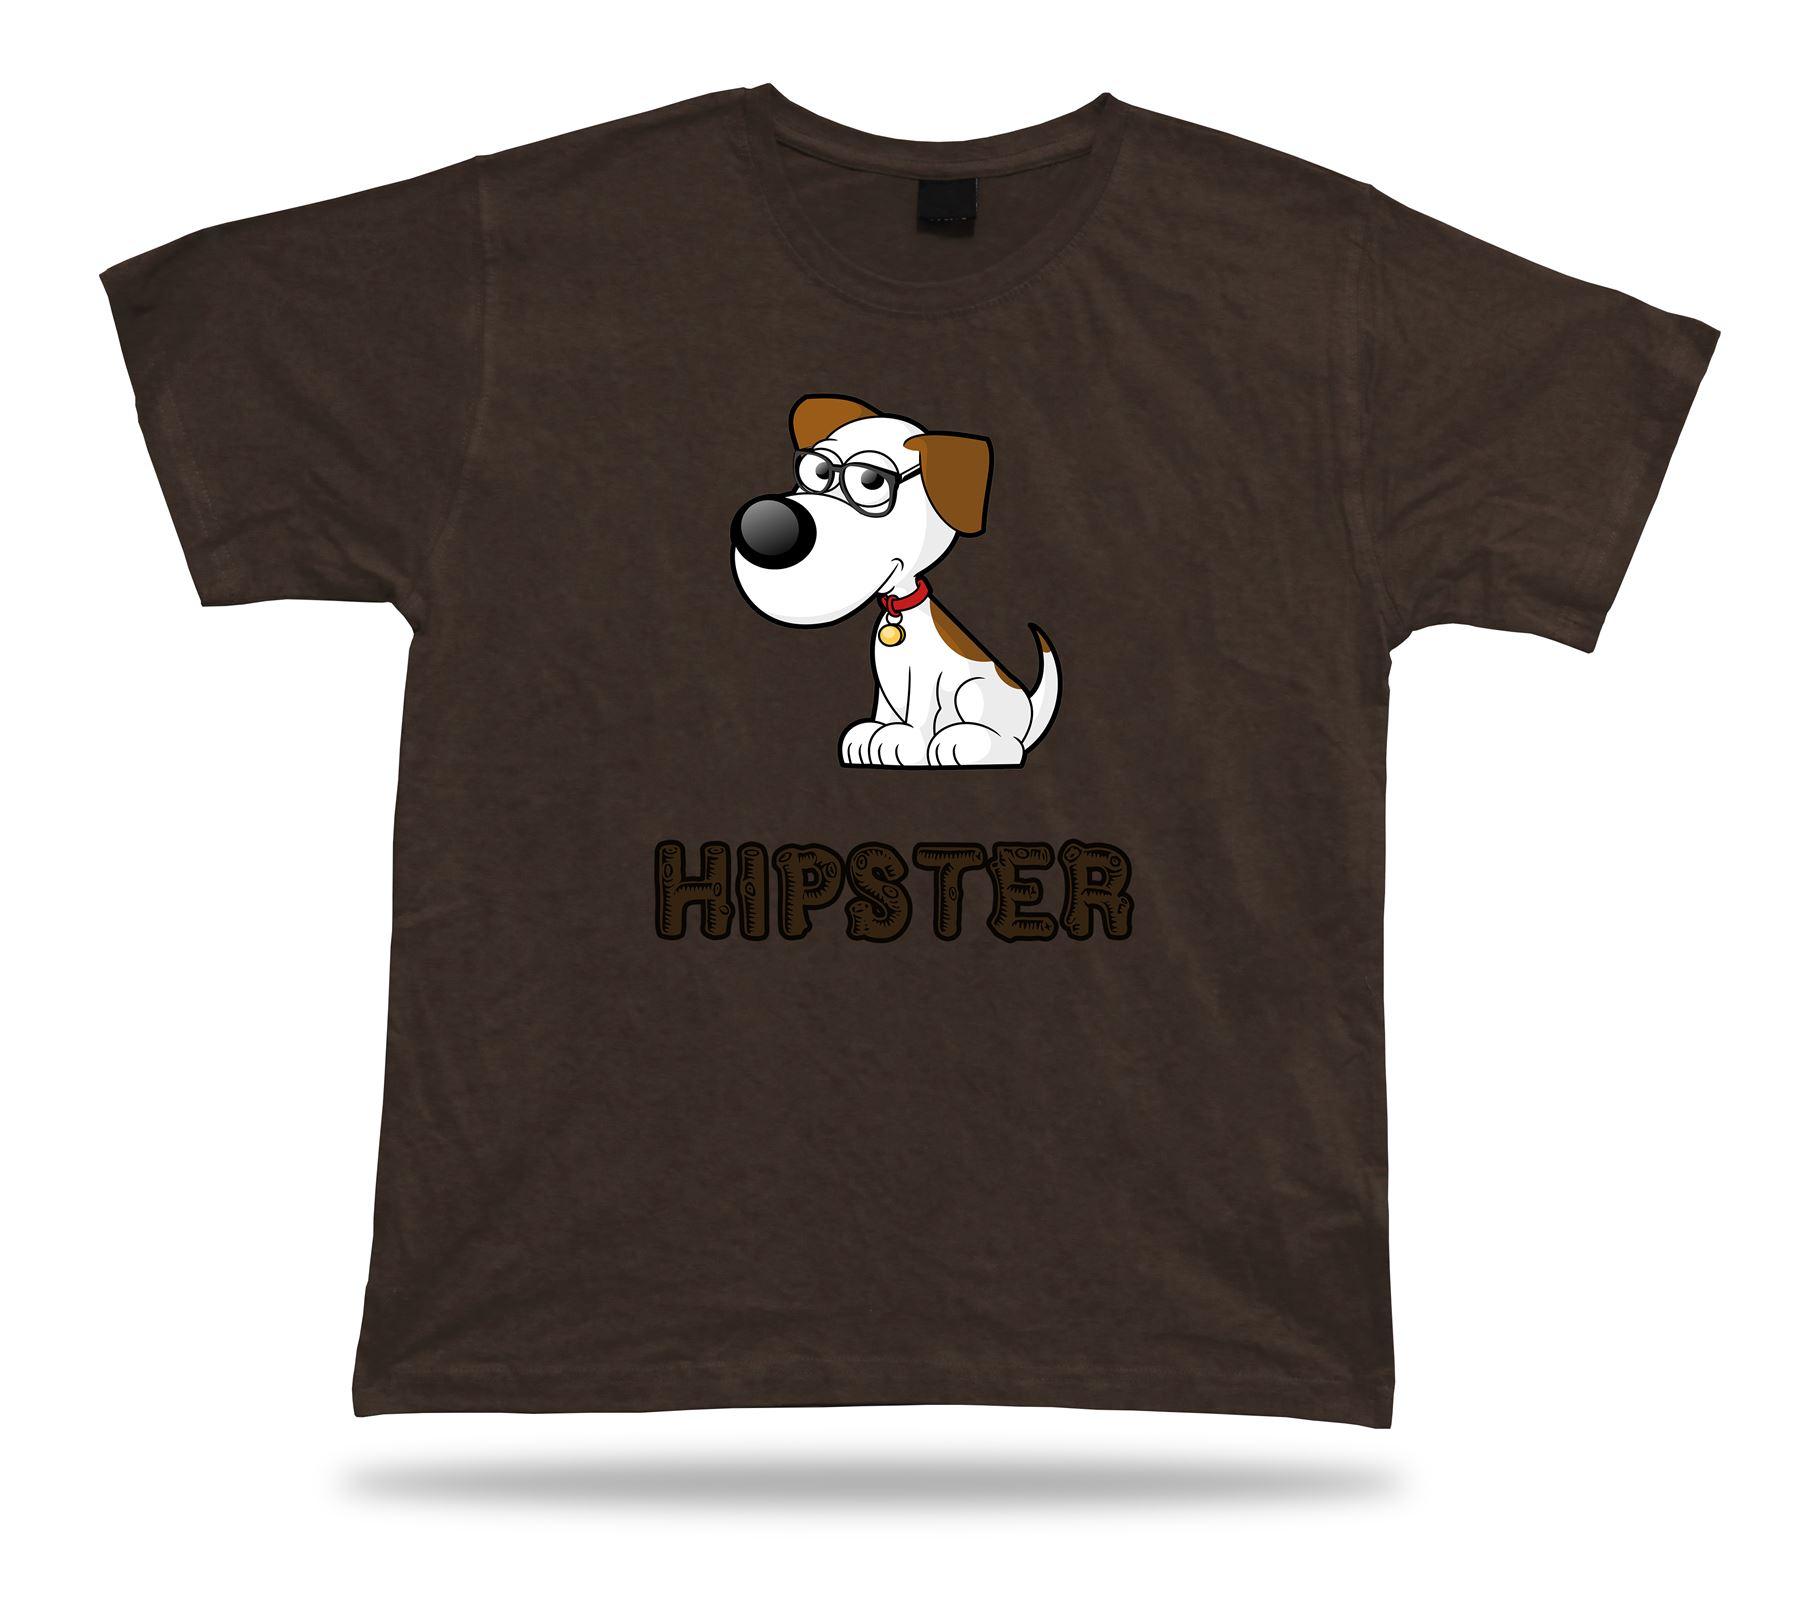 Nerdy Tee Cool Geek Dog T Shirt Funny Modern Fashion Smart